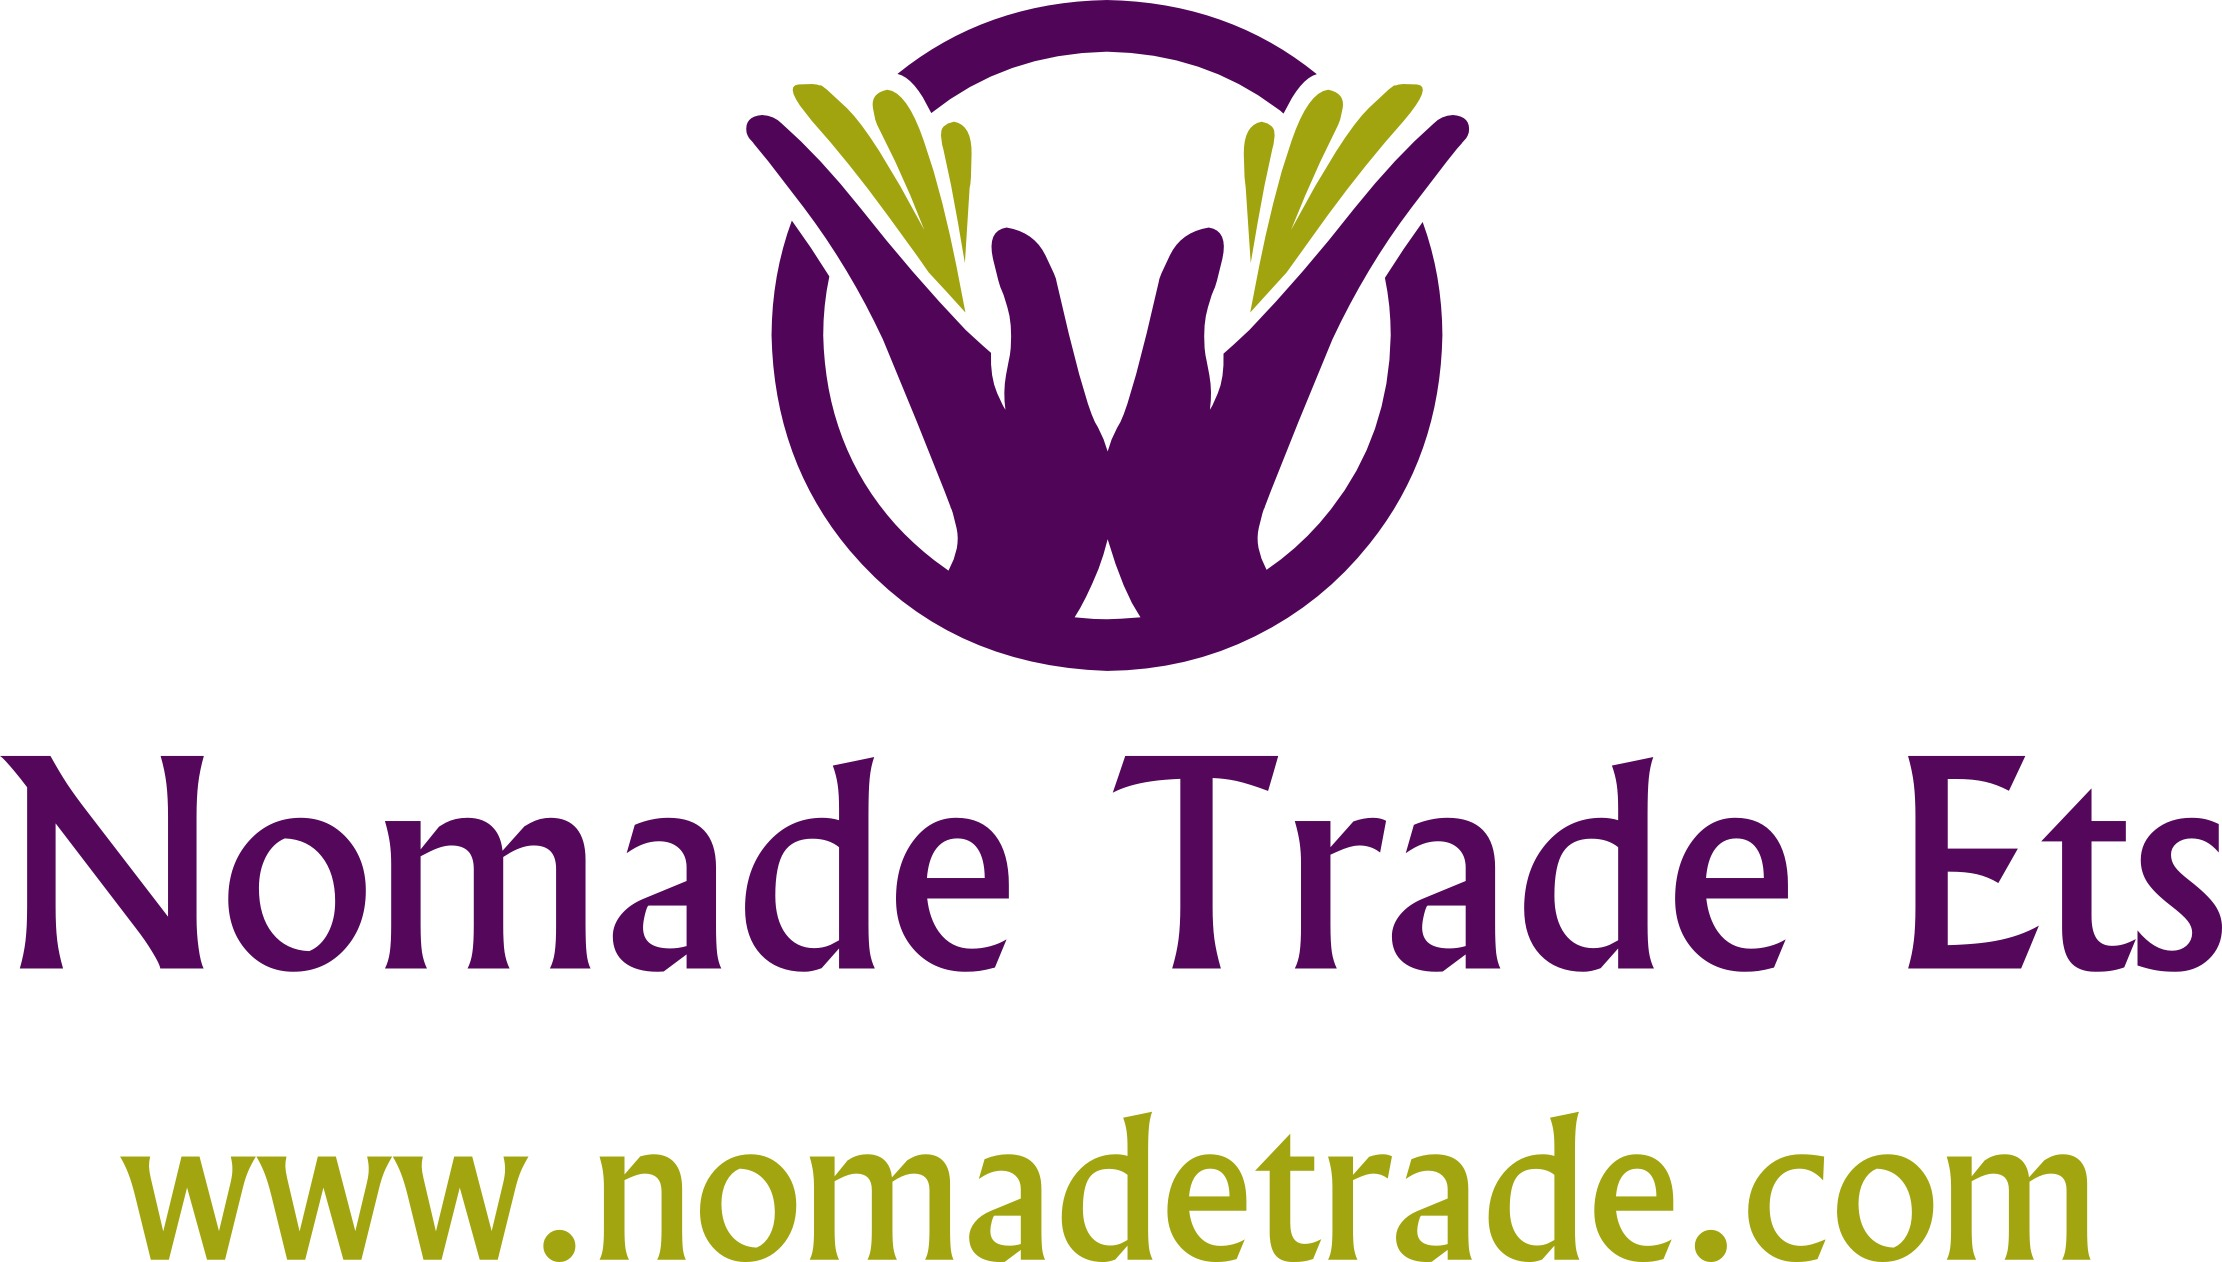 Nomade Trade Ets logo